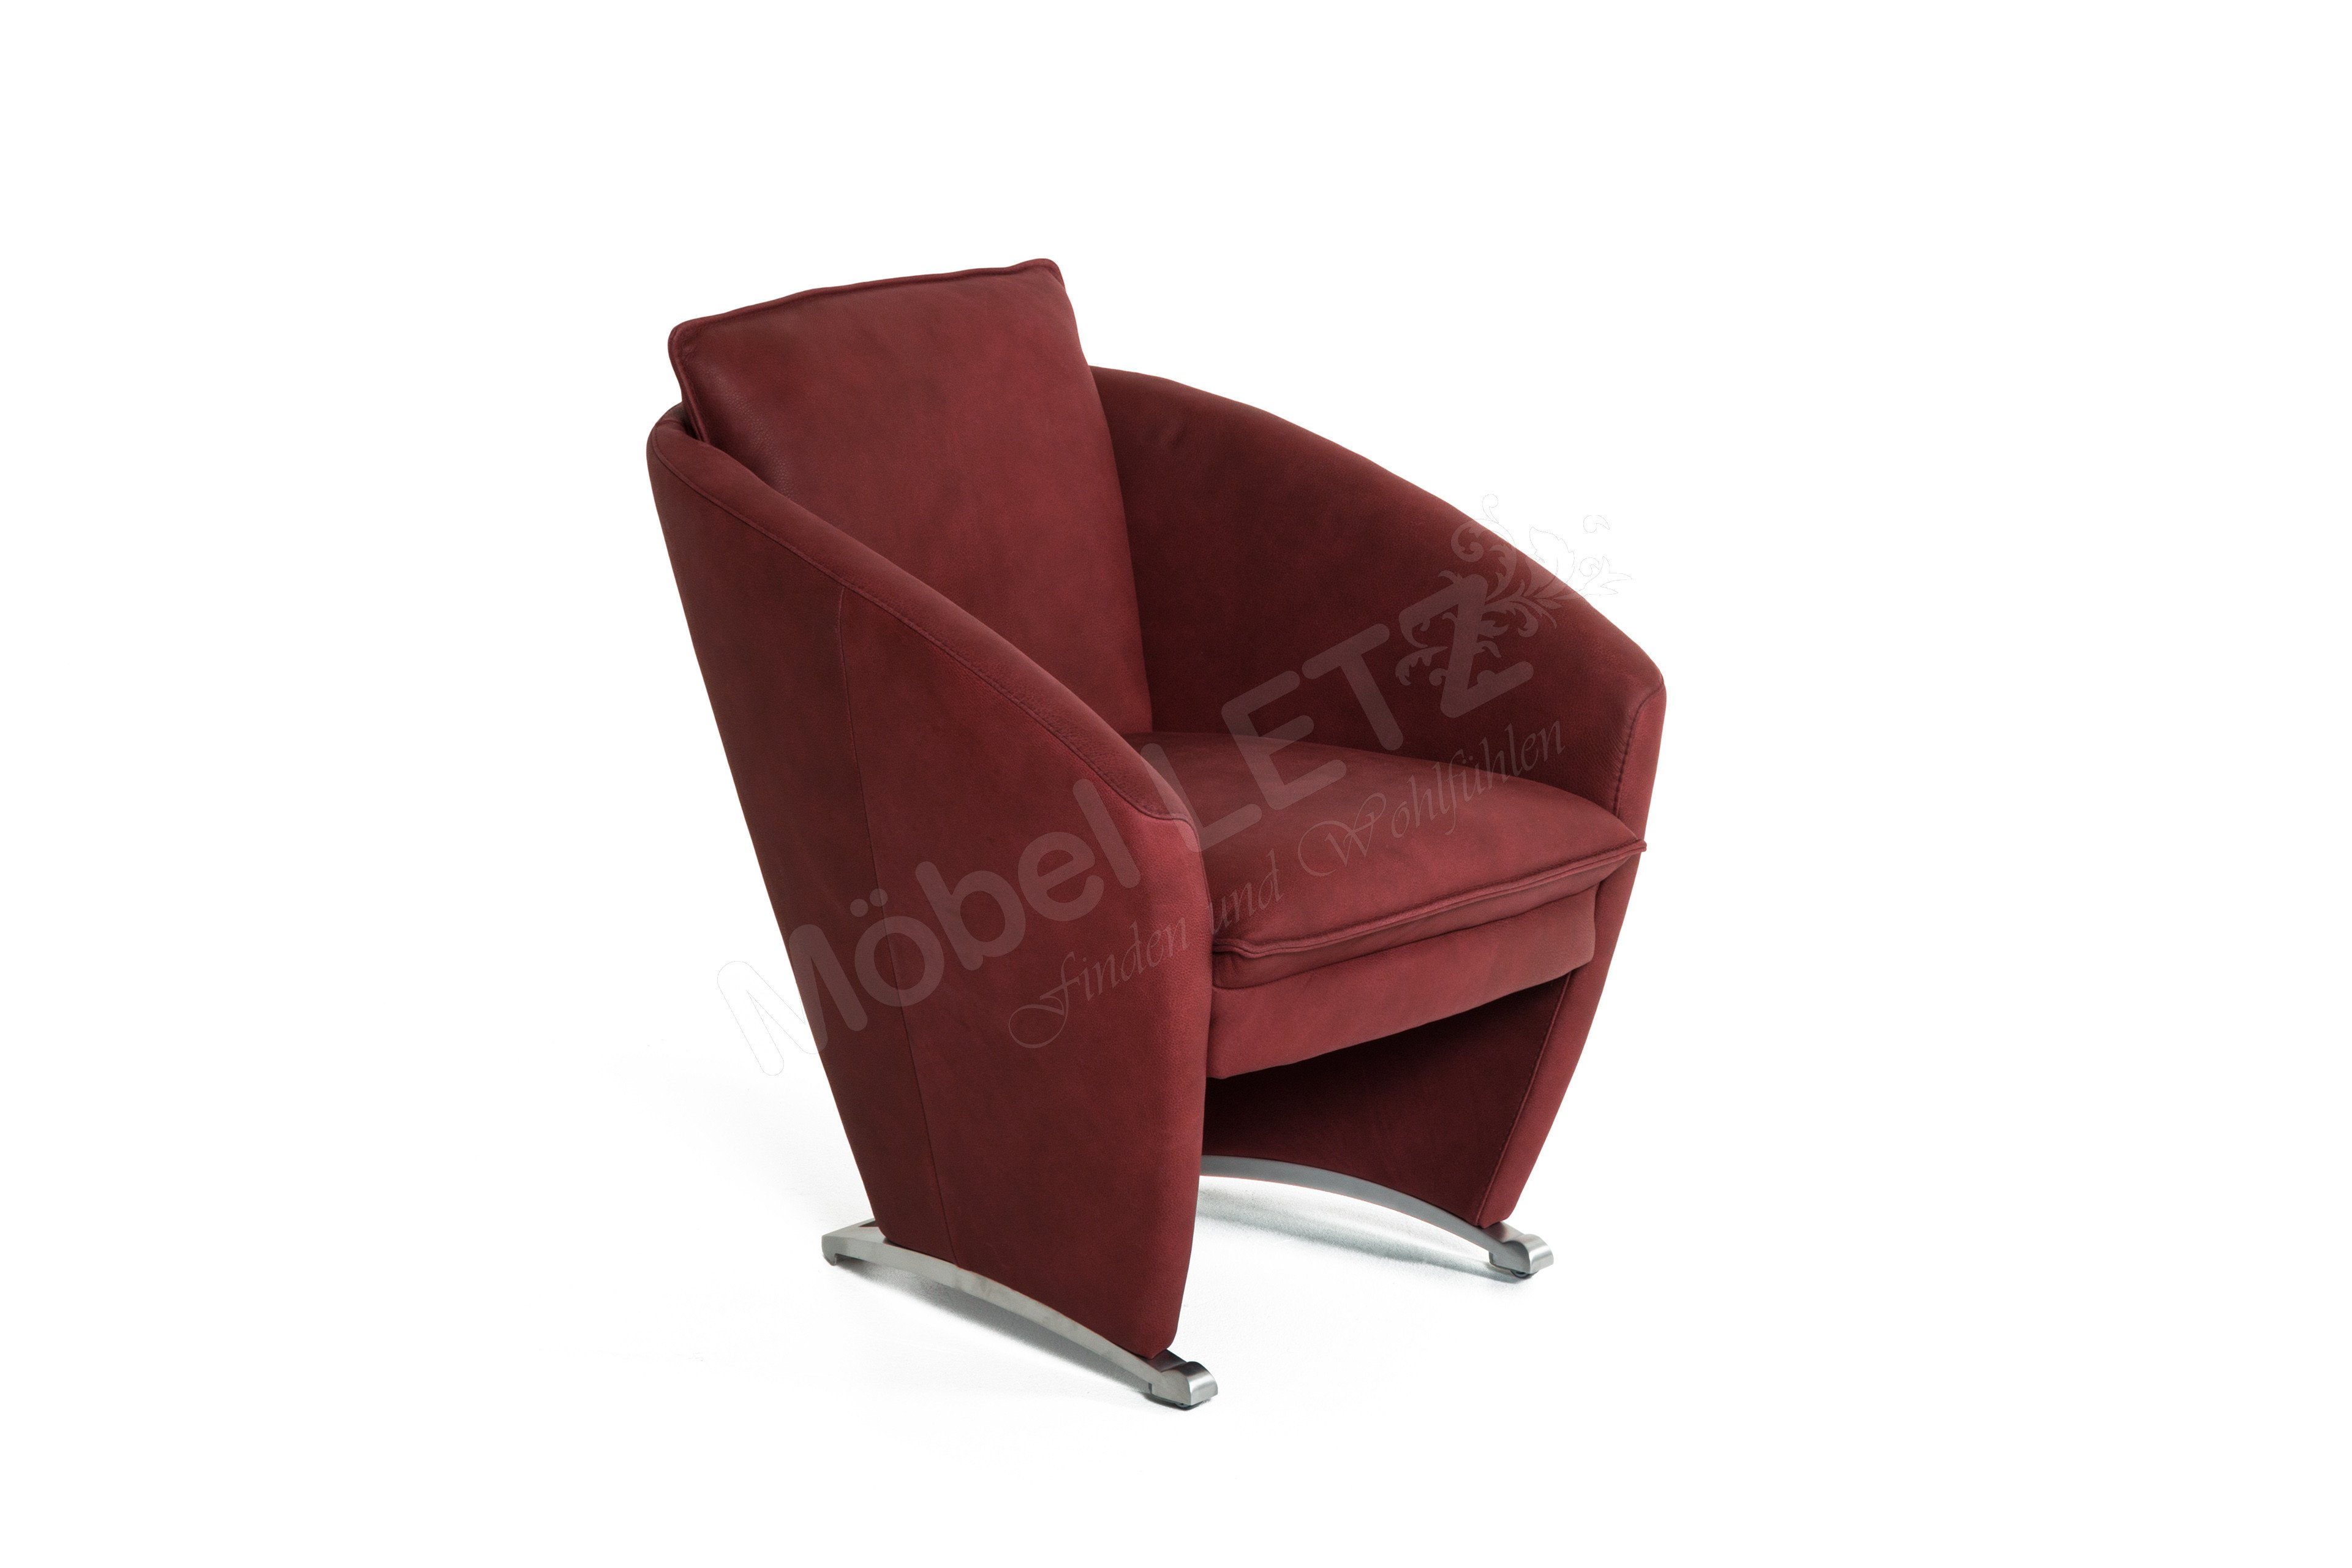 k w polsterm bel melody 7266 polstergarnitur grau m bel letz ihr online shop. Black Bedroom Furniture Sets. Home Design Ideas